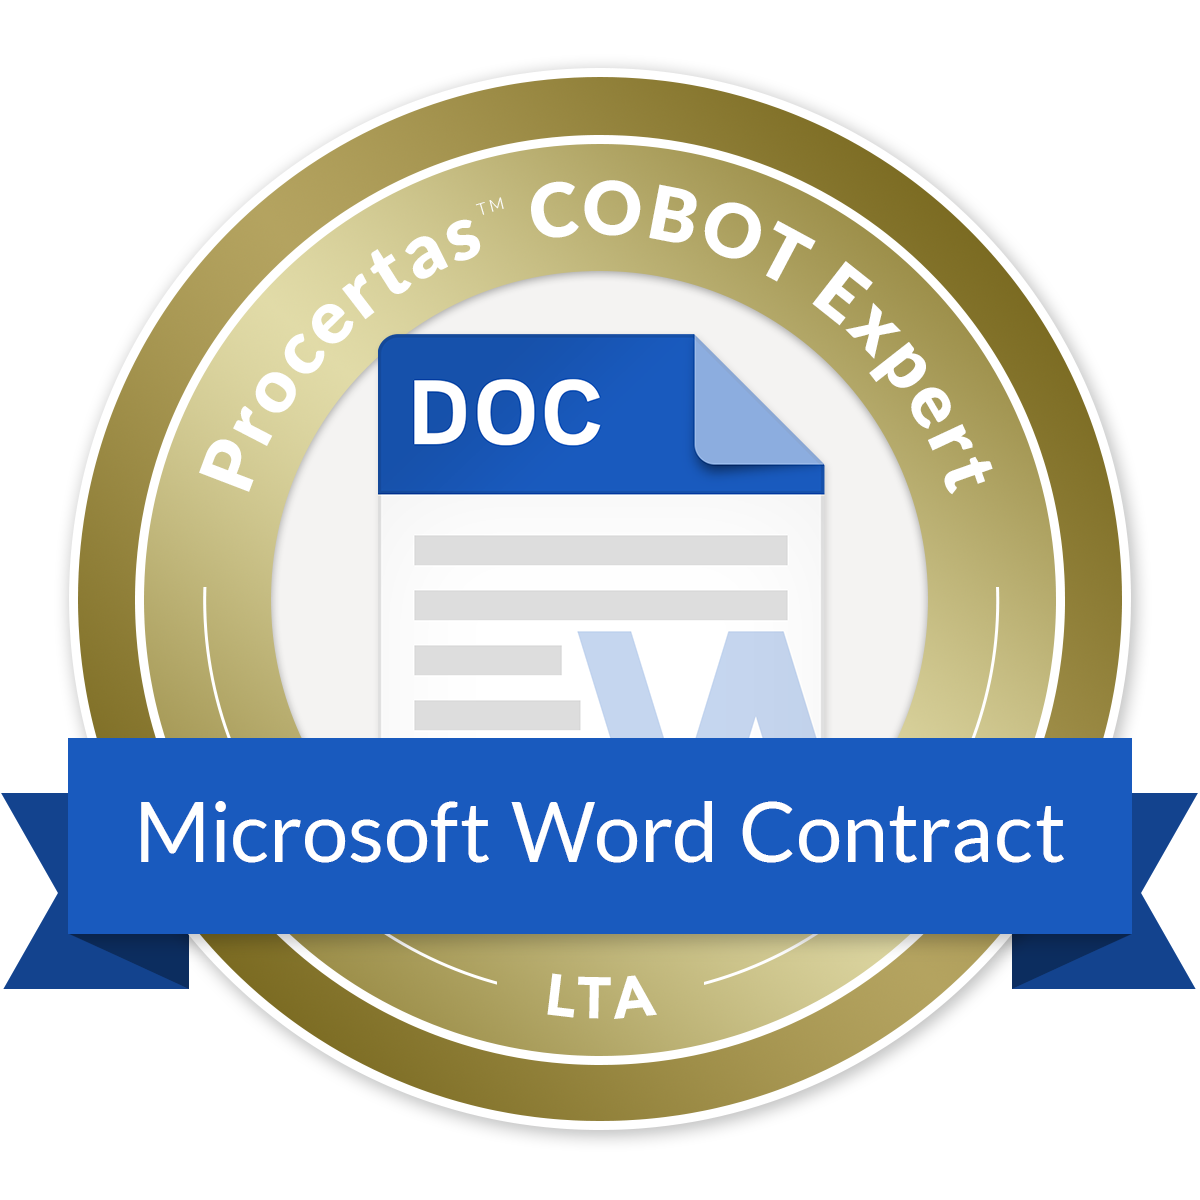 COBOT Expert - Word Contract